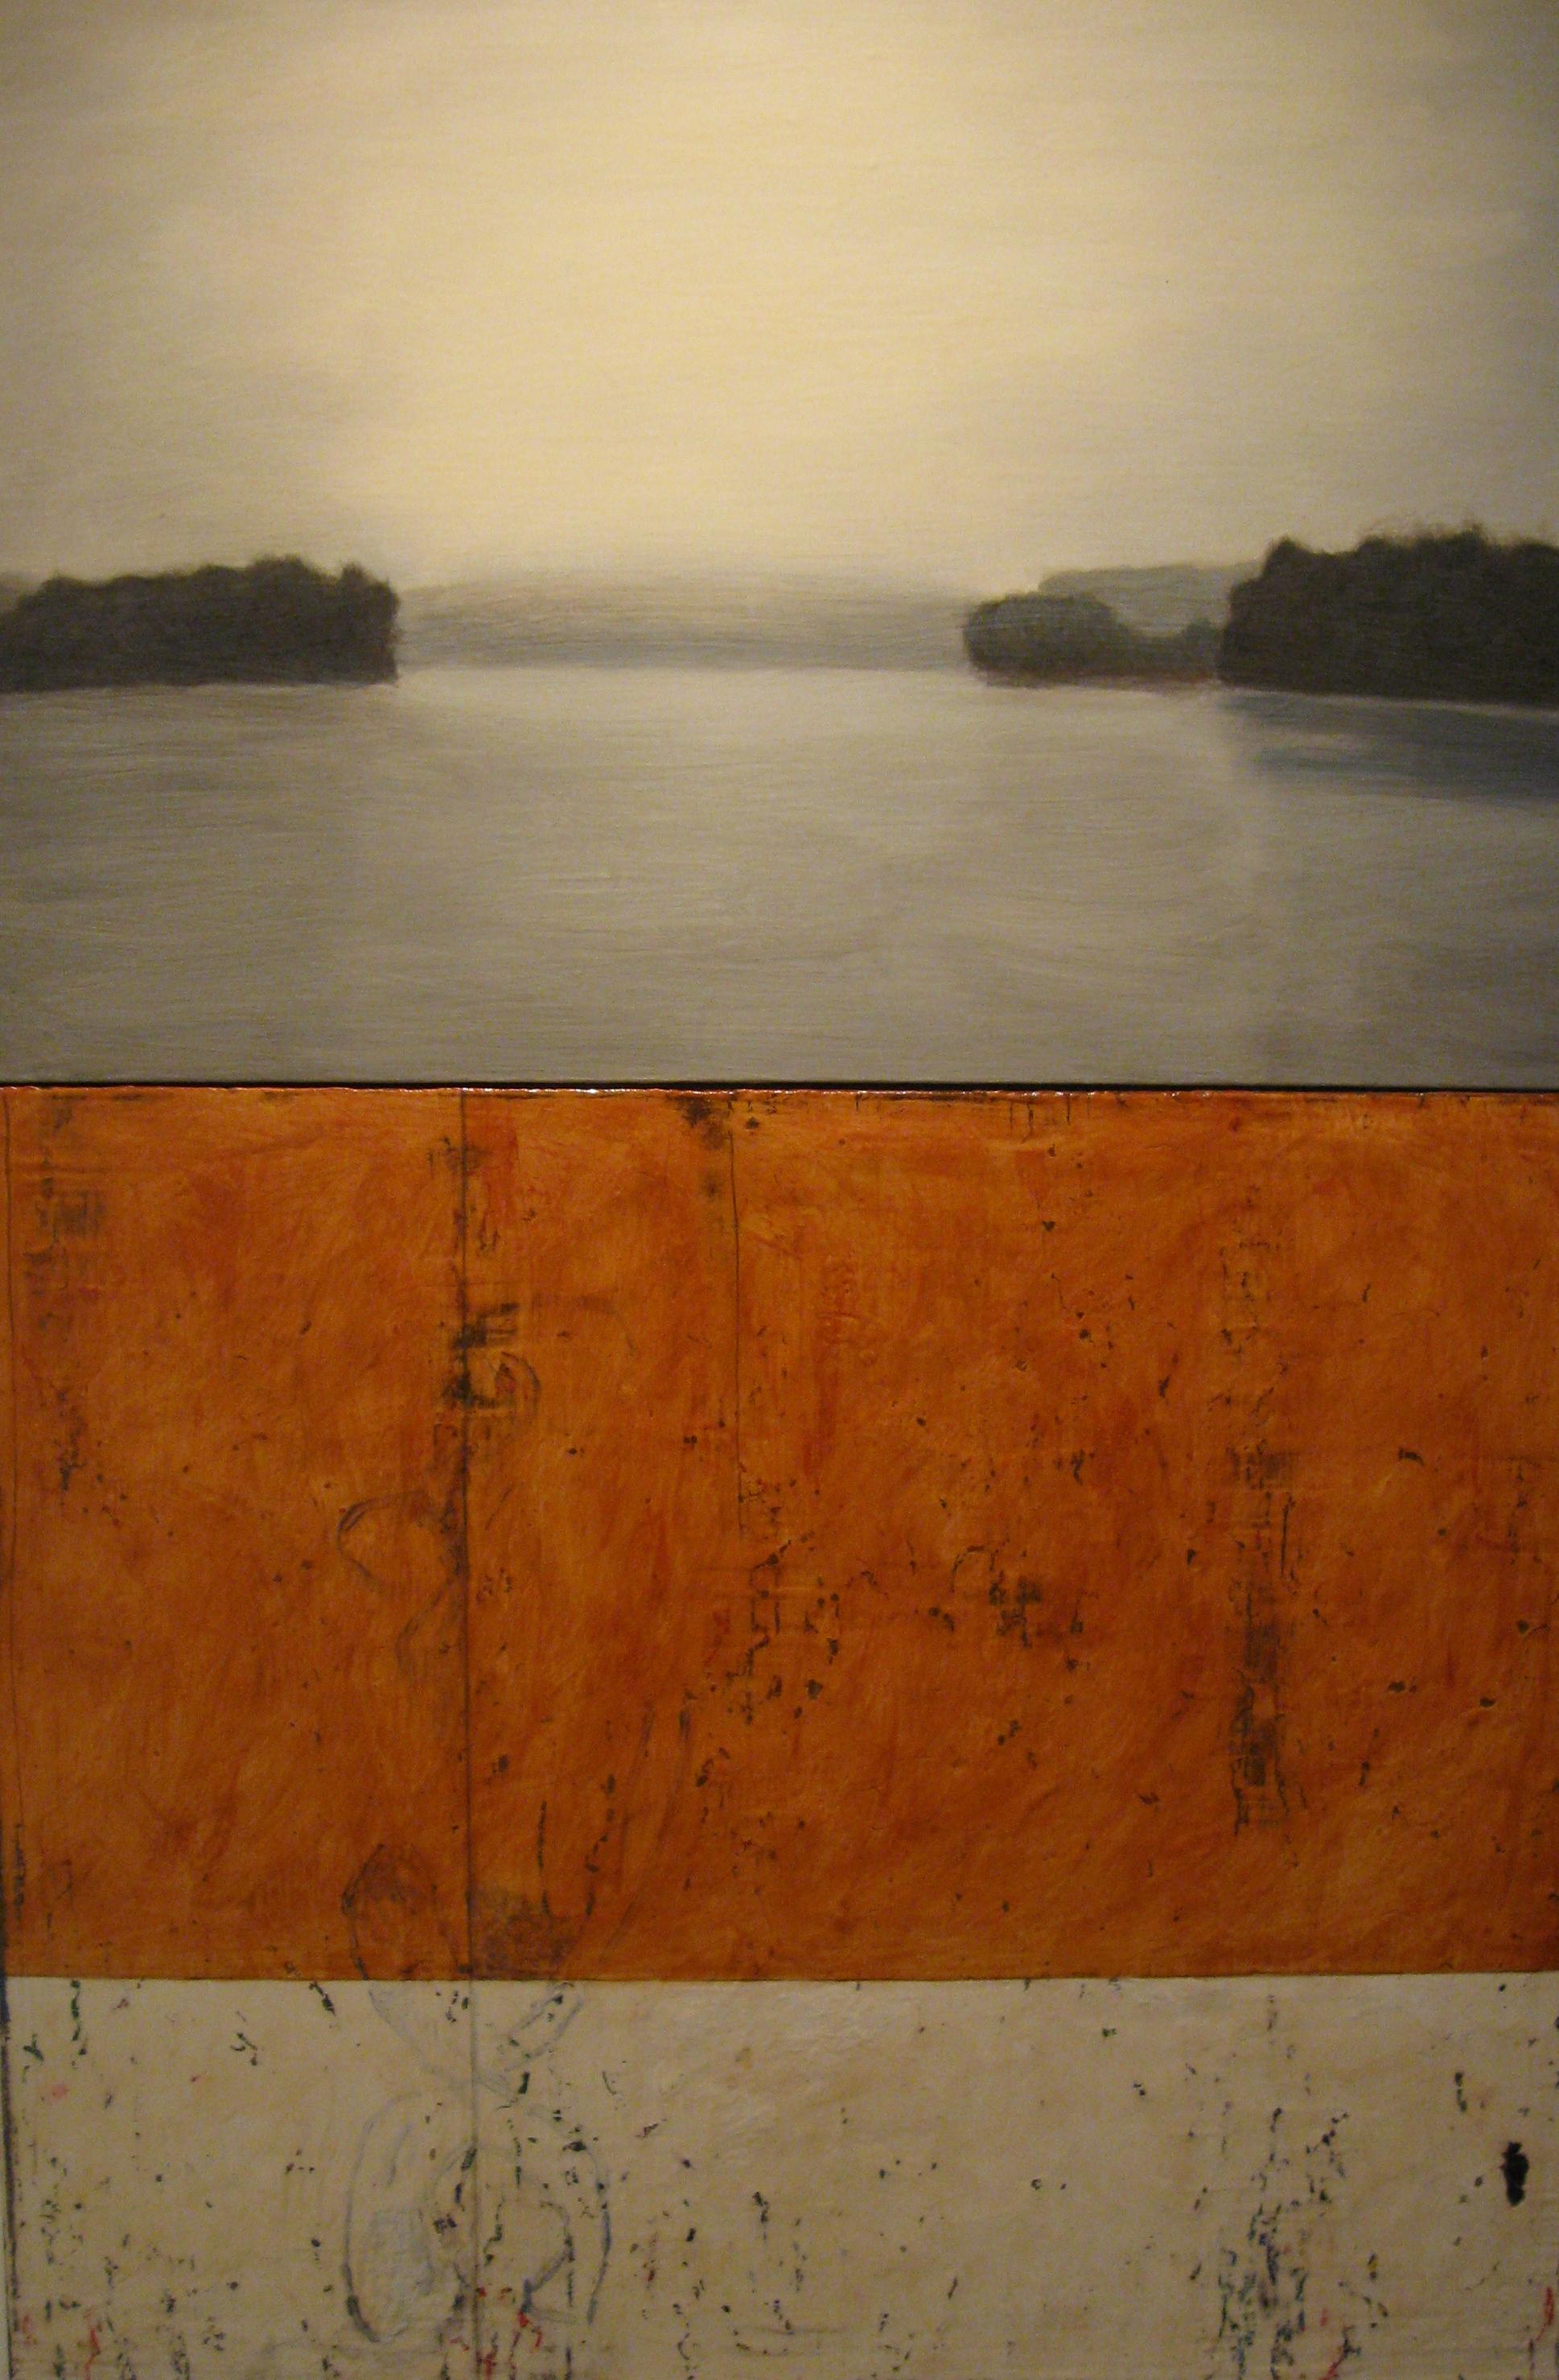 """Calendar #3"" by Chuck Swanson.Acrylic on canvas, 70x40in, POR"